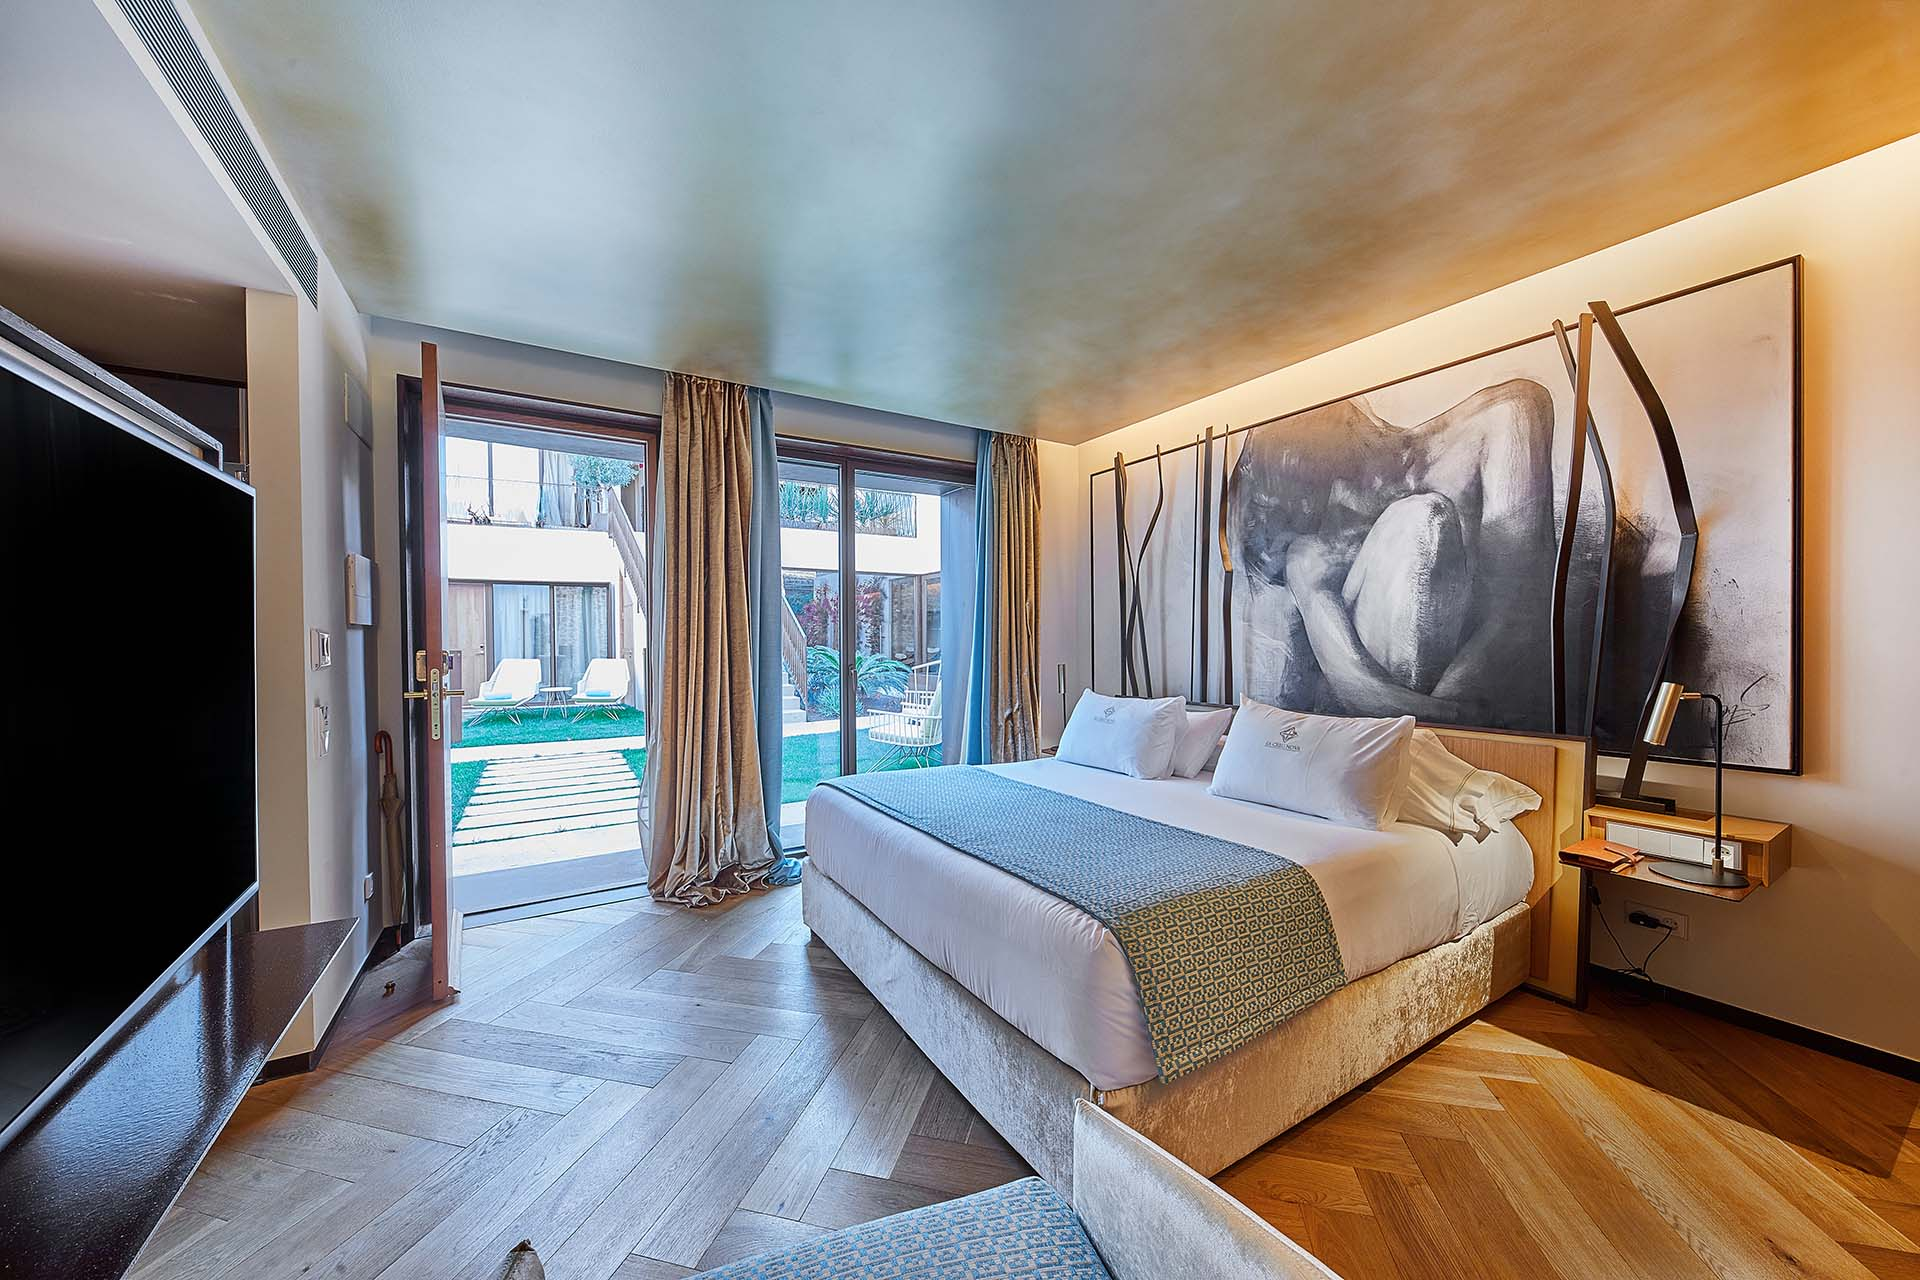 Superior Room - Sa Creu Nova - Luxury Hotel South Mallorca